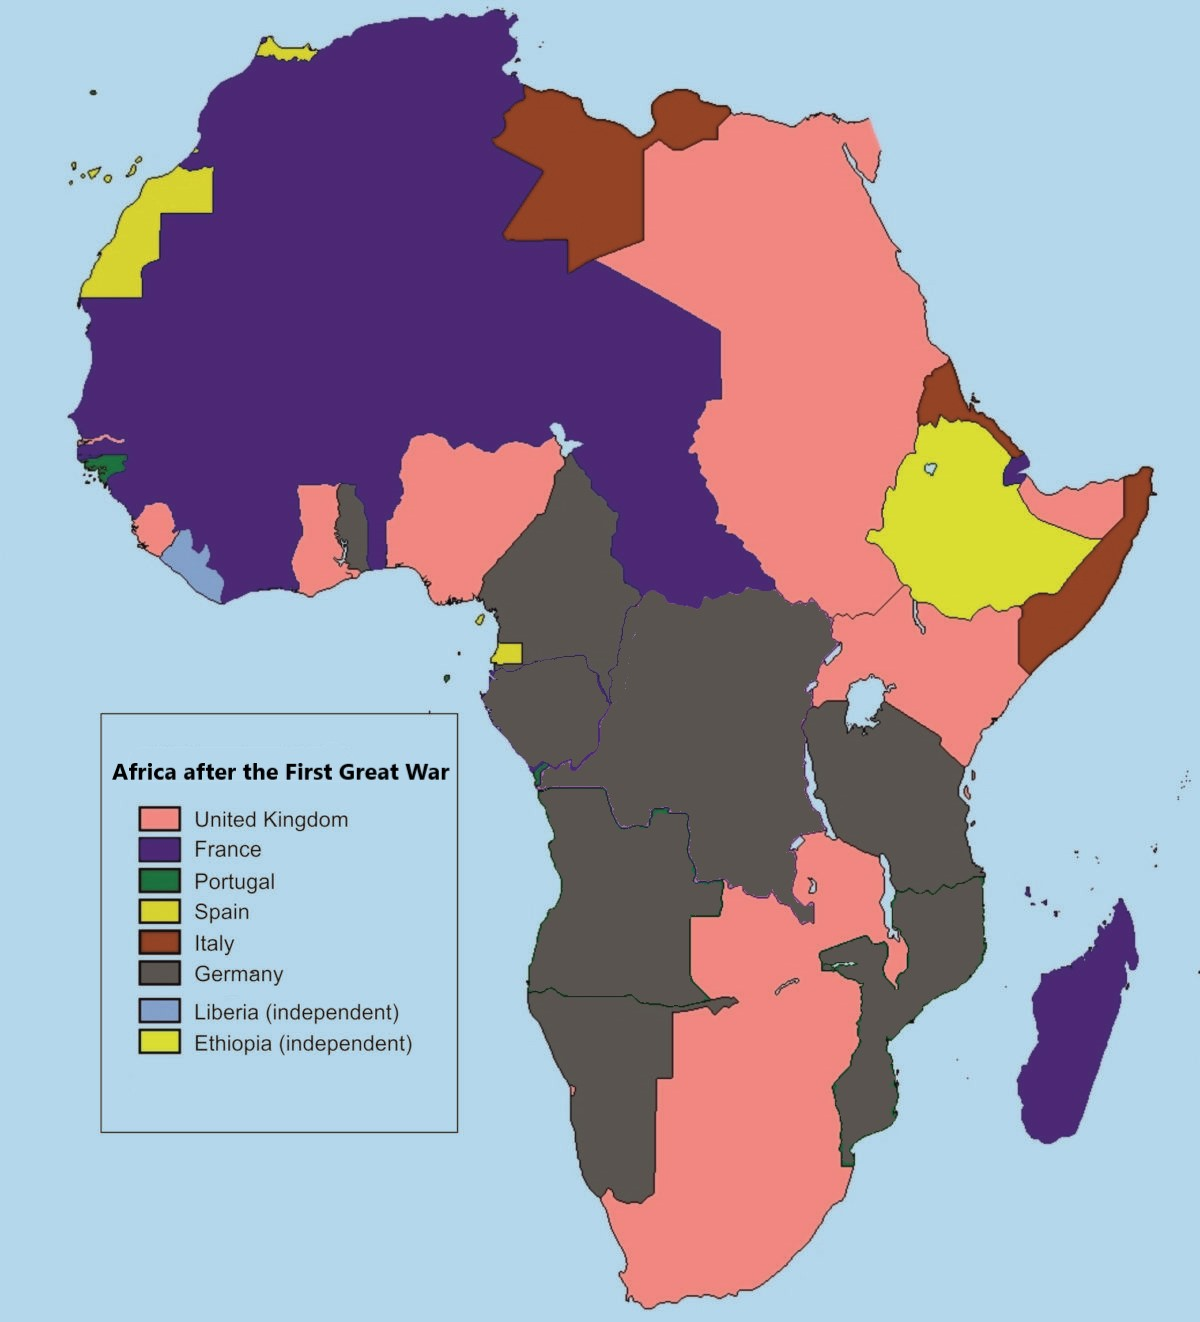 Altversion of africa after fgw.jpg